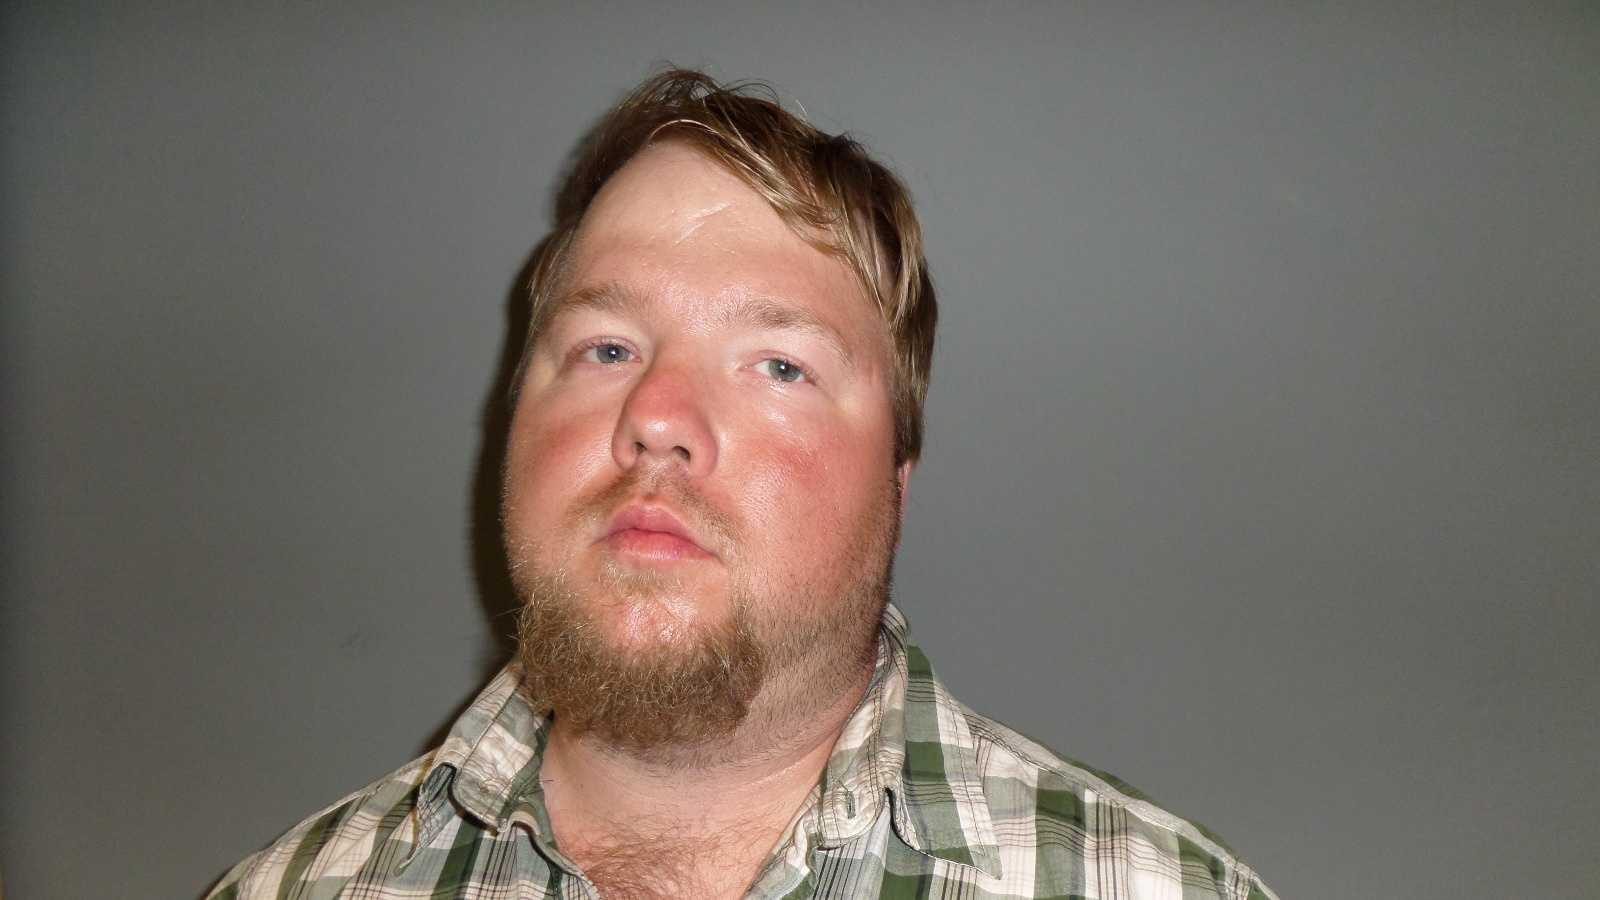 34-year-old Nathan Dunbar accused of growing 50 marijuana plants inside his residence in Duxbury, Vt.